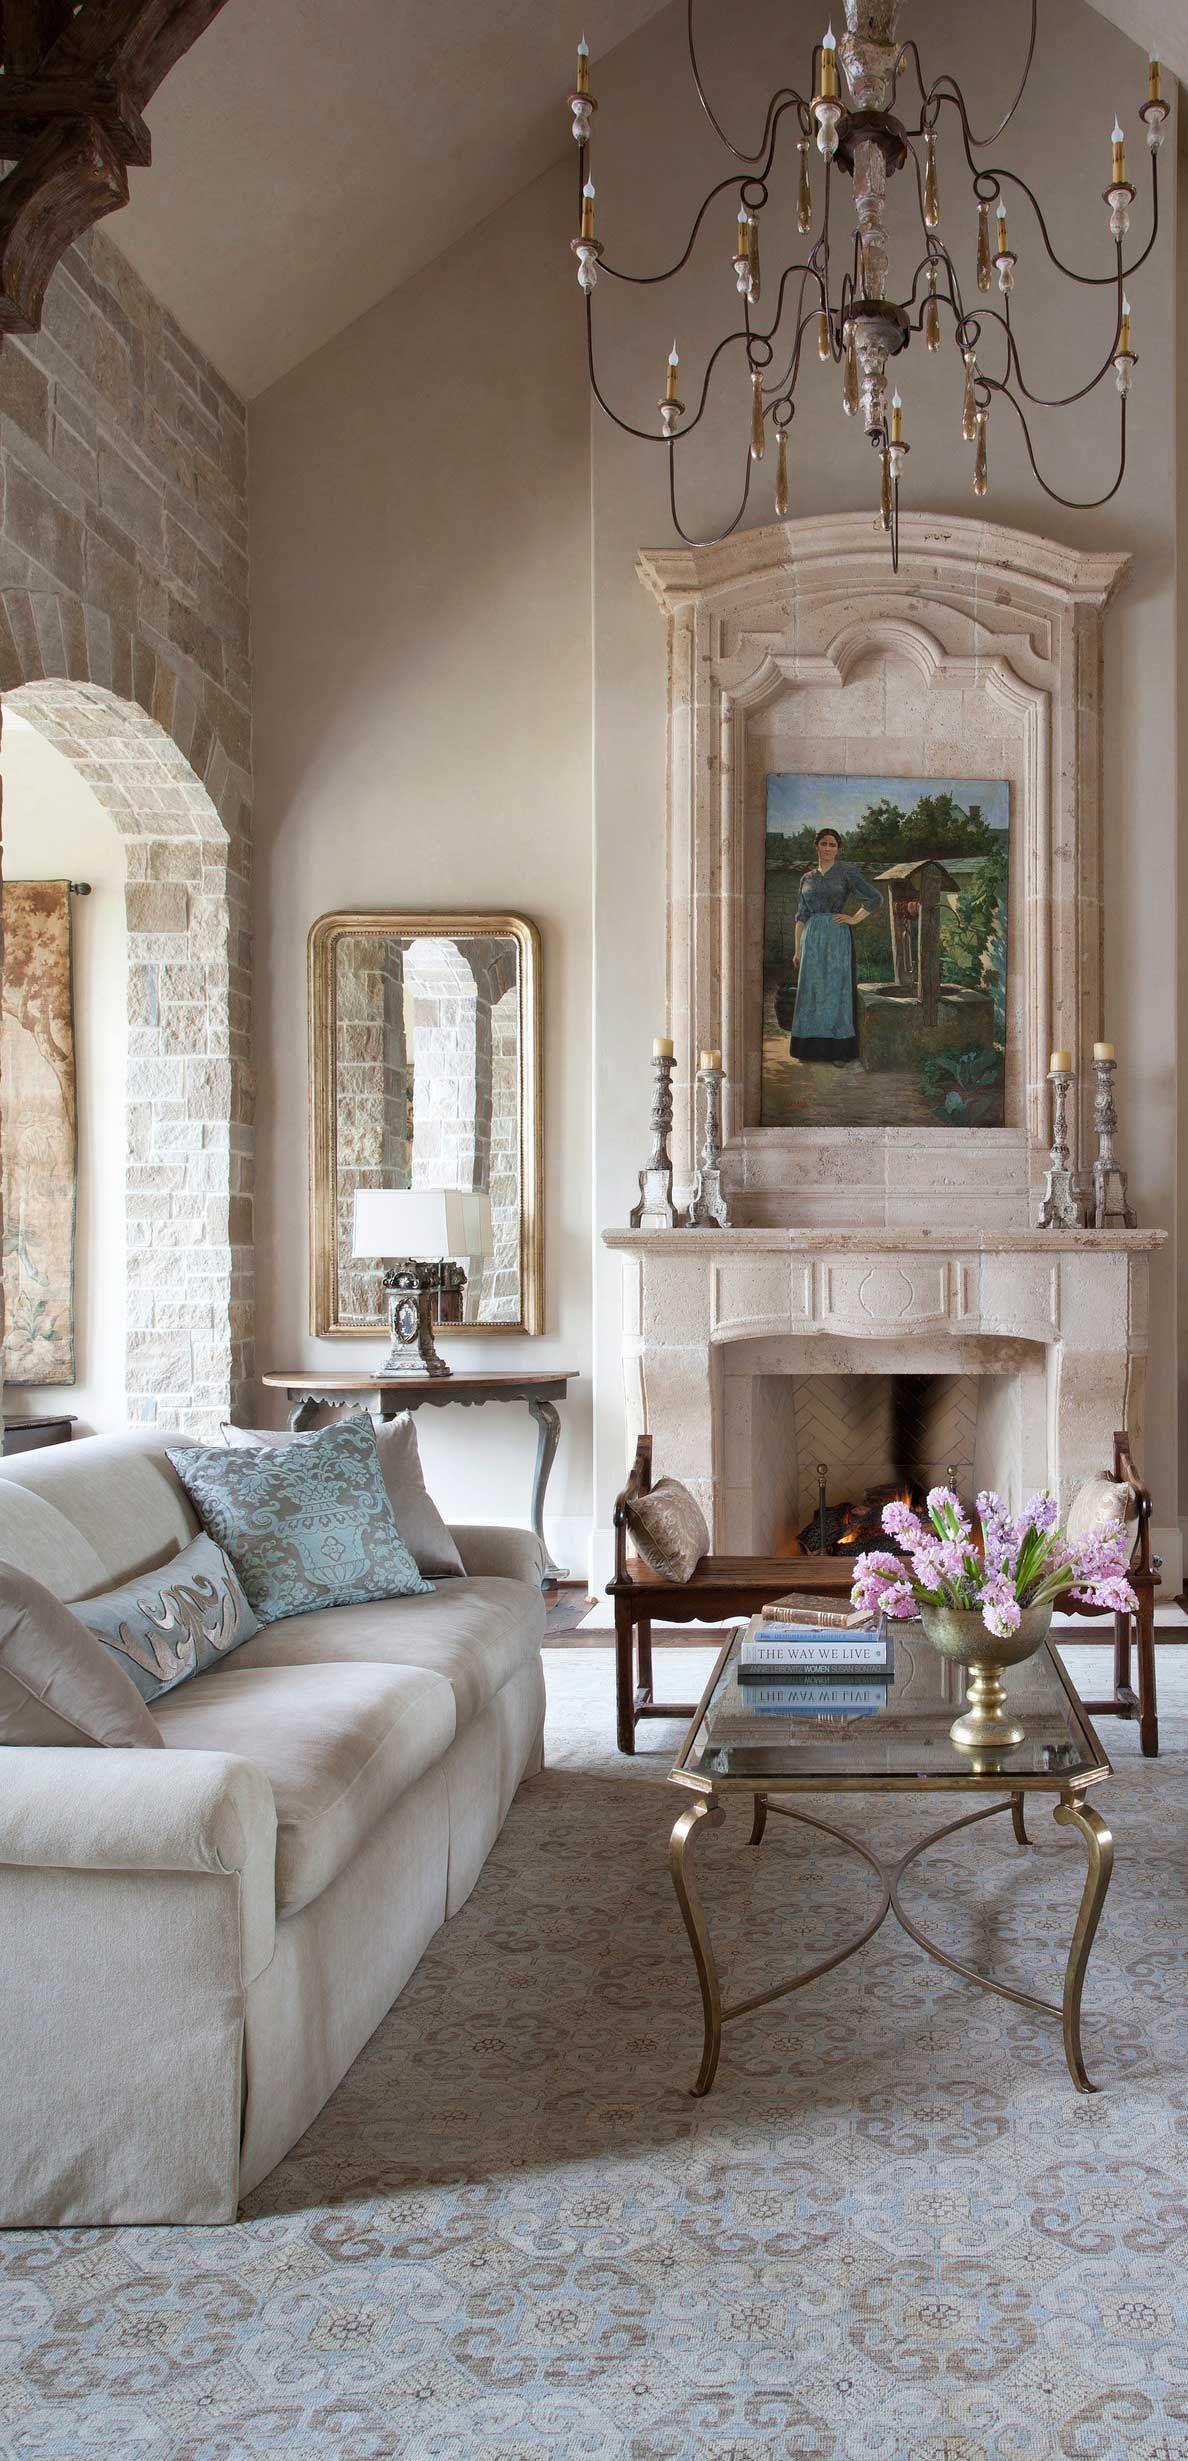 Tuscan Mediterranean Living Room Chandelier Fireplace  Old World Fascinating Italian Living Room Design 2018